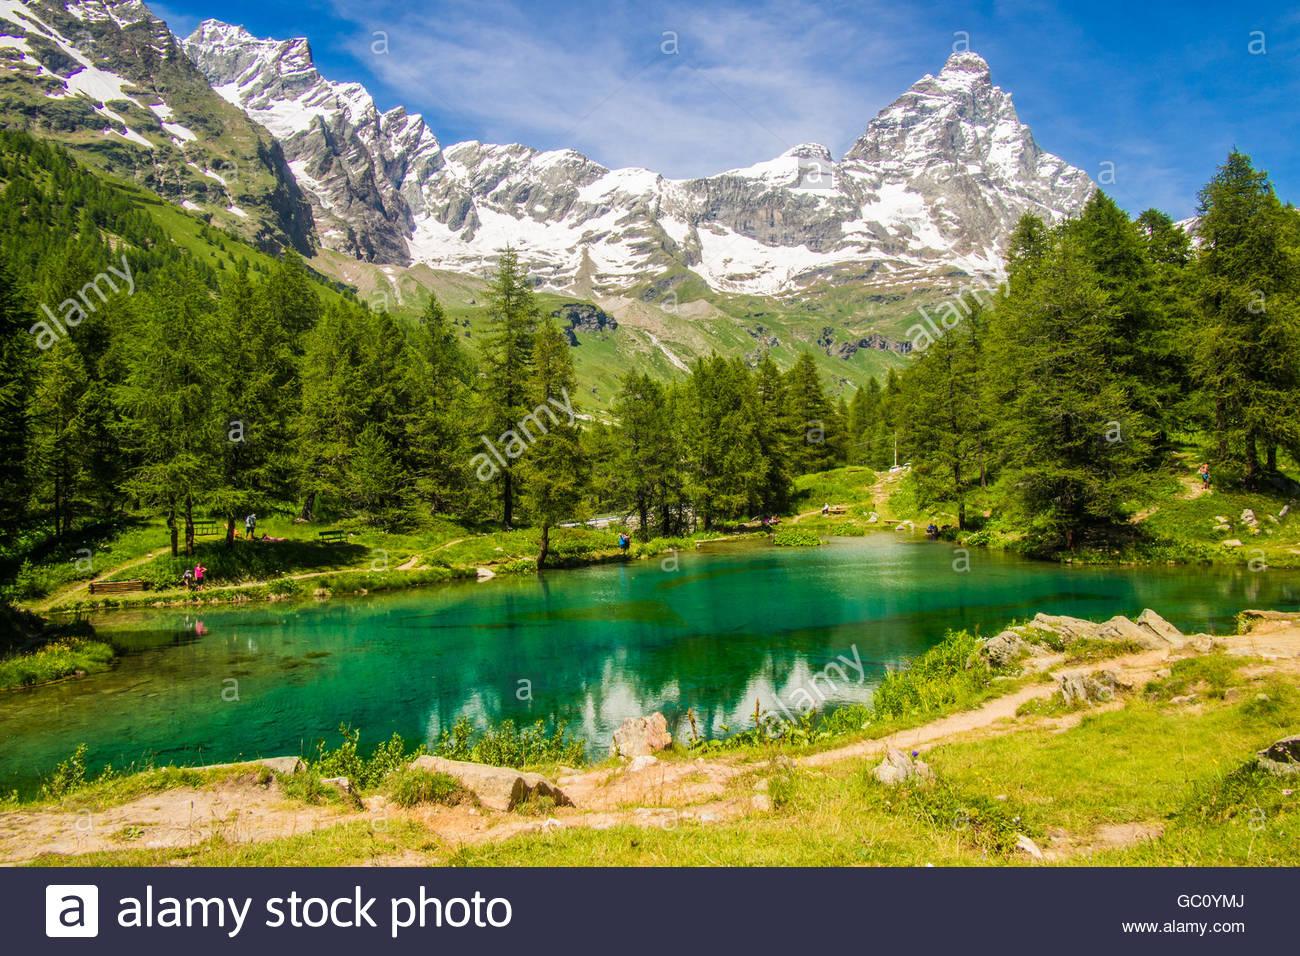 Lago Blu (Lake Blue), with the Cervino Mountain (aka Matterhorn in Switzerland), Aosta Valley, Italy. - Stock Image